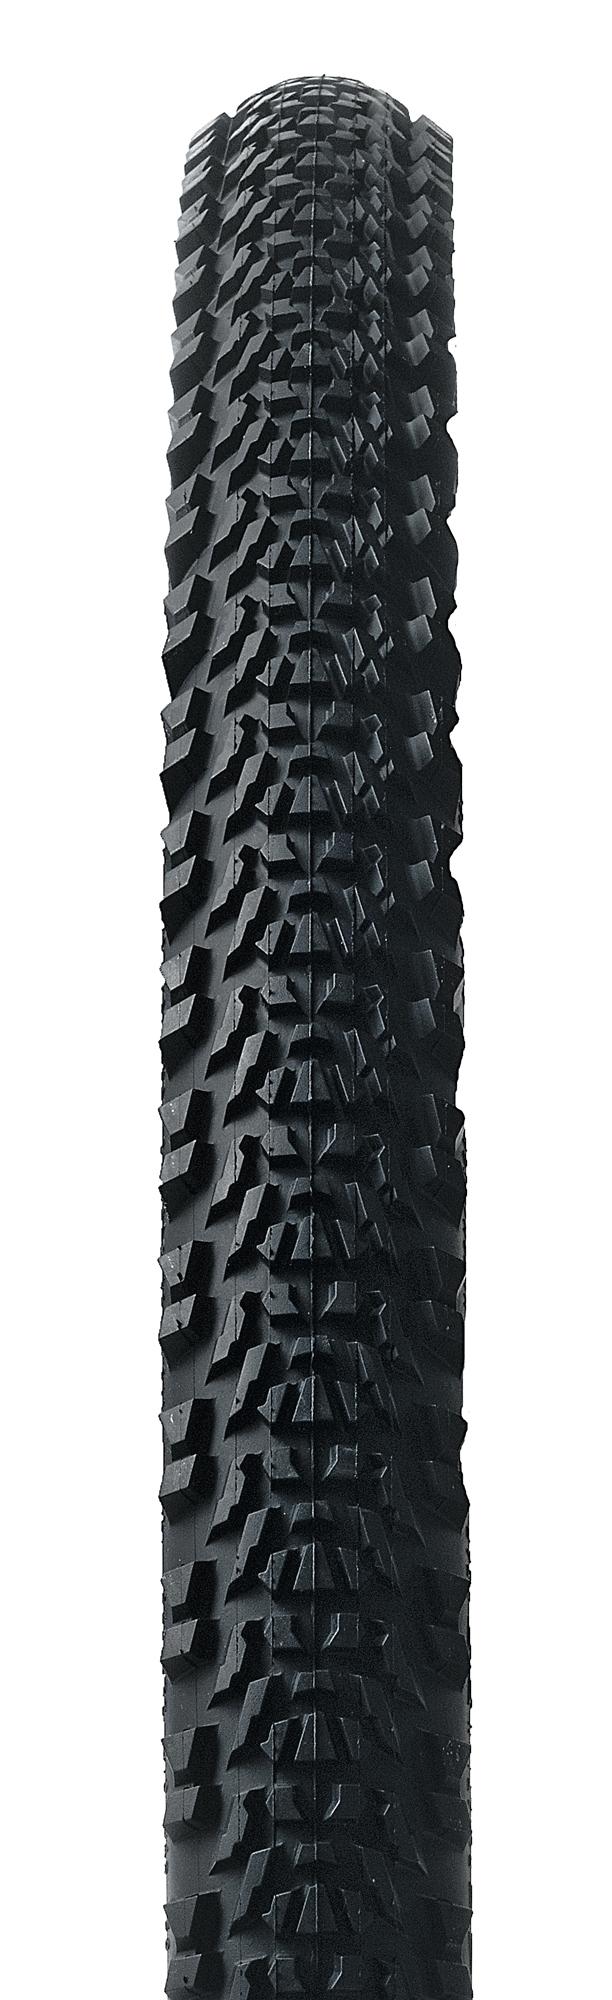 plášť HUTCH. COBRA 26x2,10 TLR kevlar set 2ks,črn.